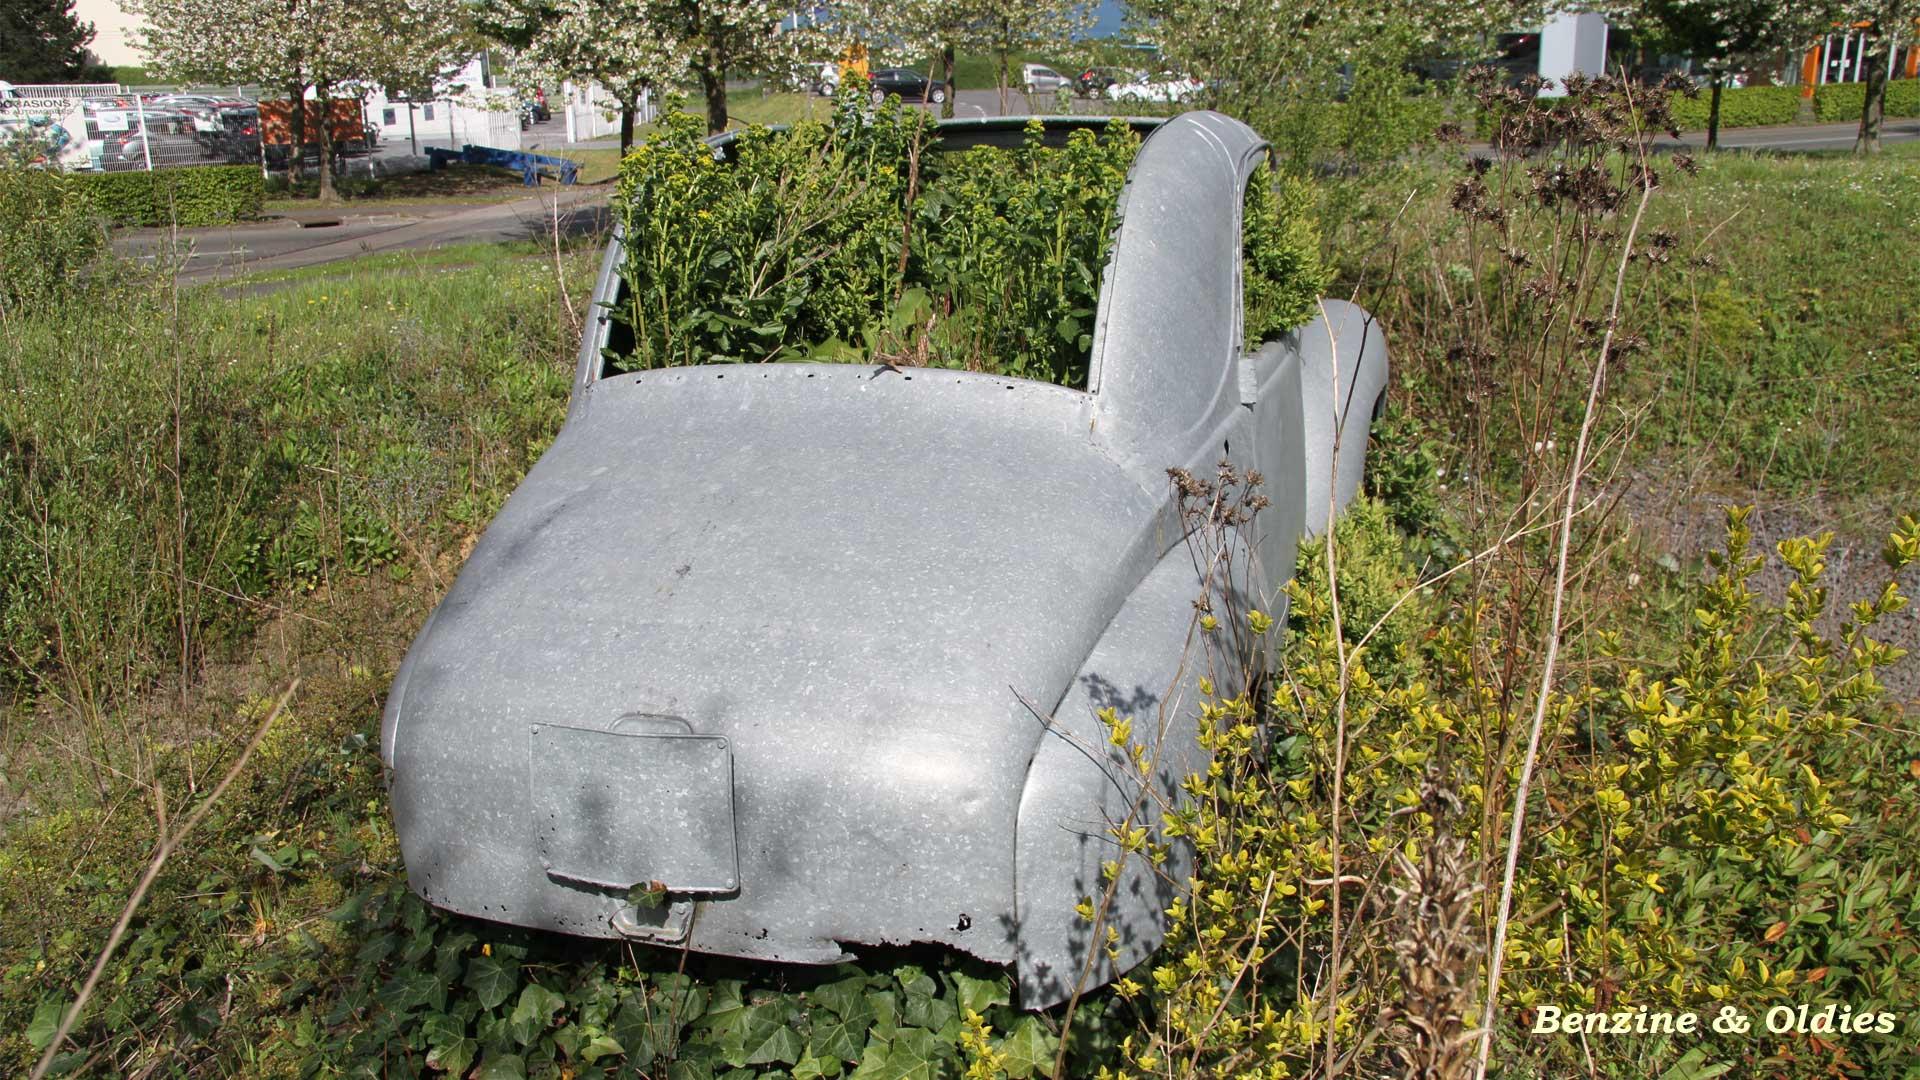 une Simca 6 carrosserie aluminium oubliée dans la nature - Simca6 - Page 2 249012simca6street32w19201080